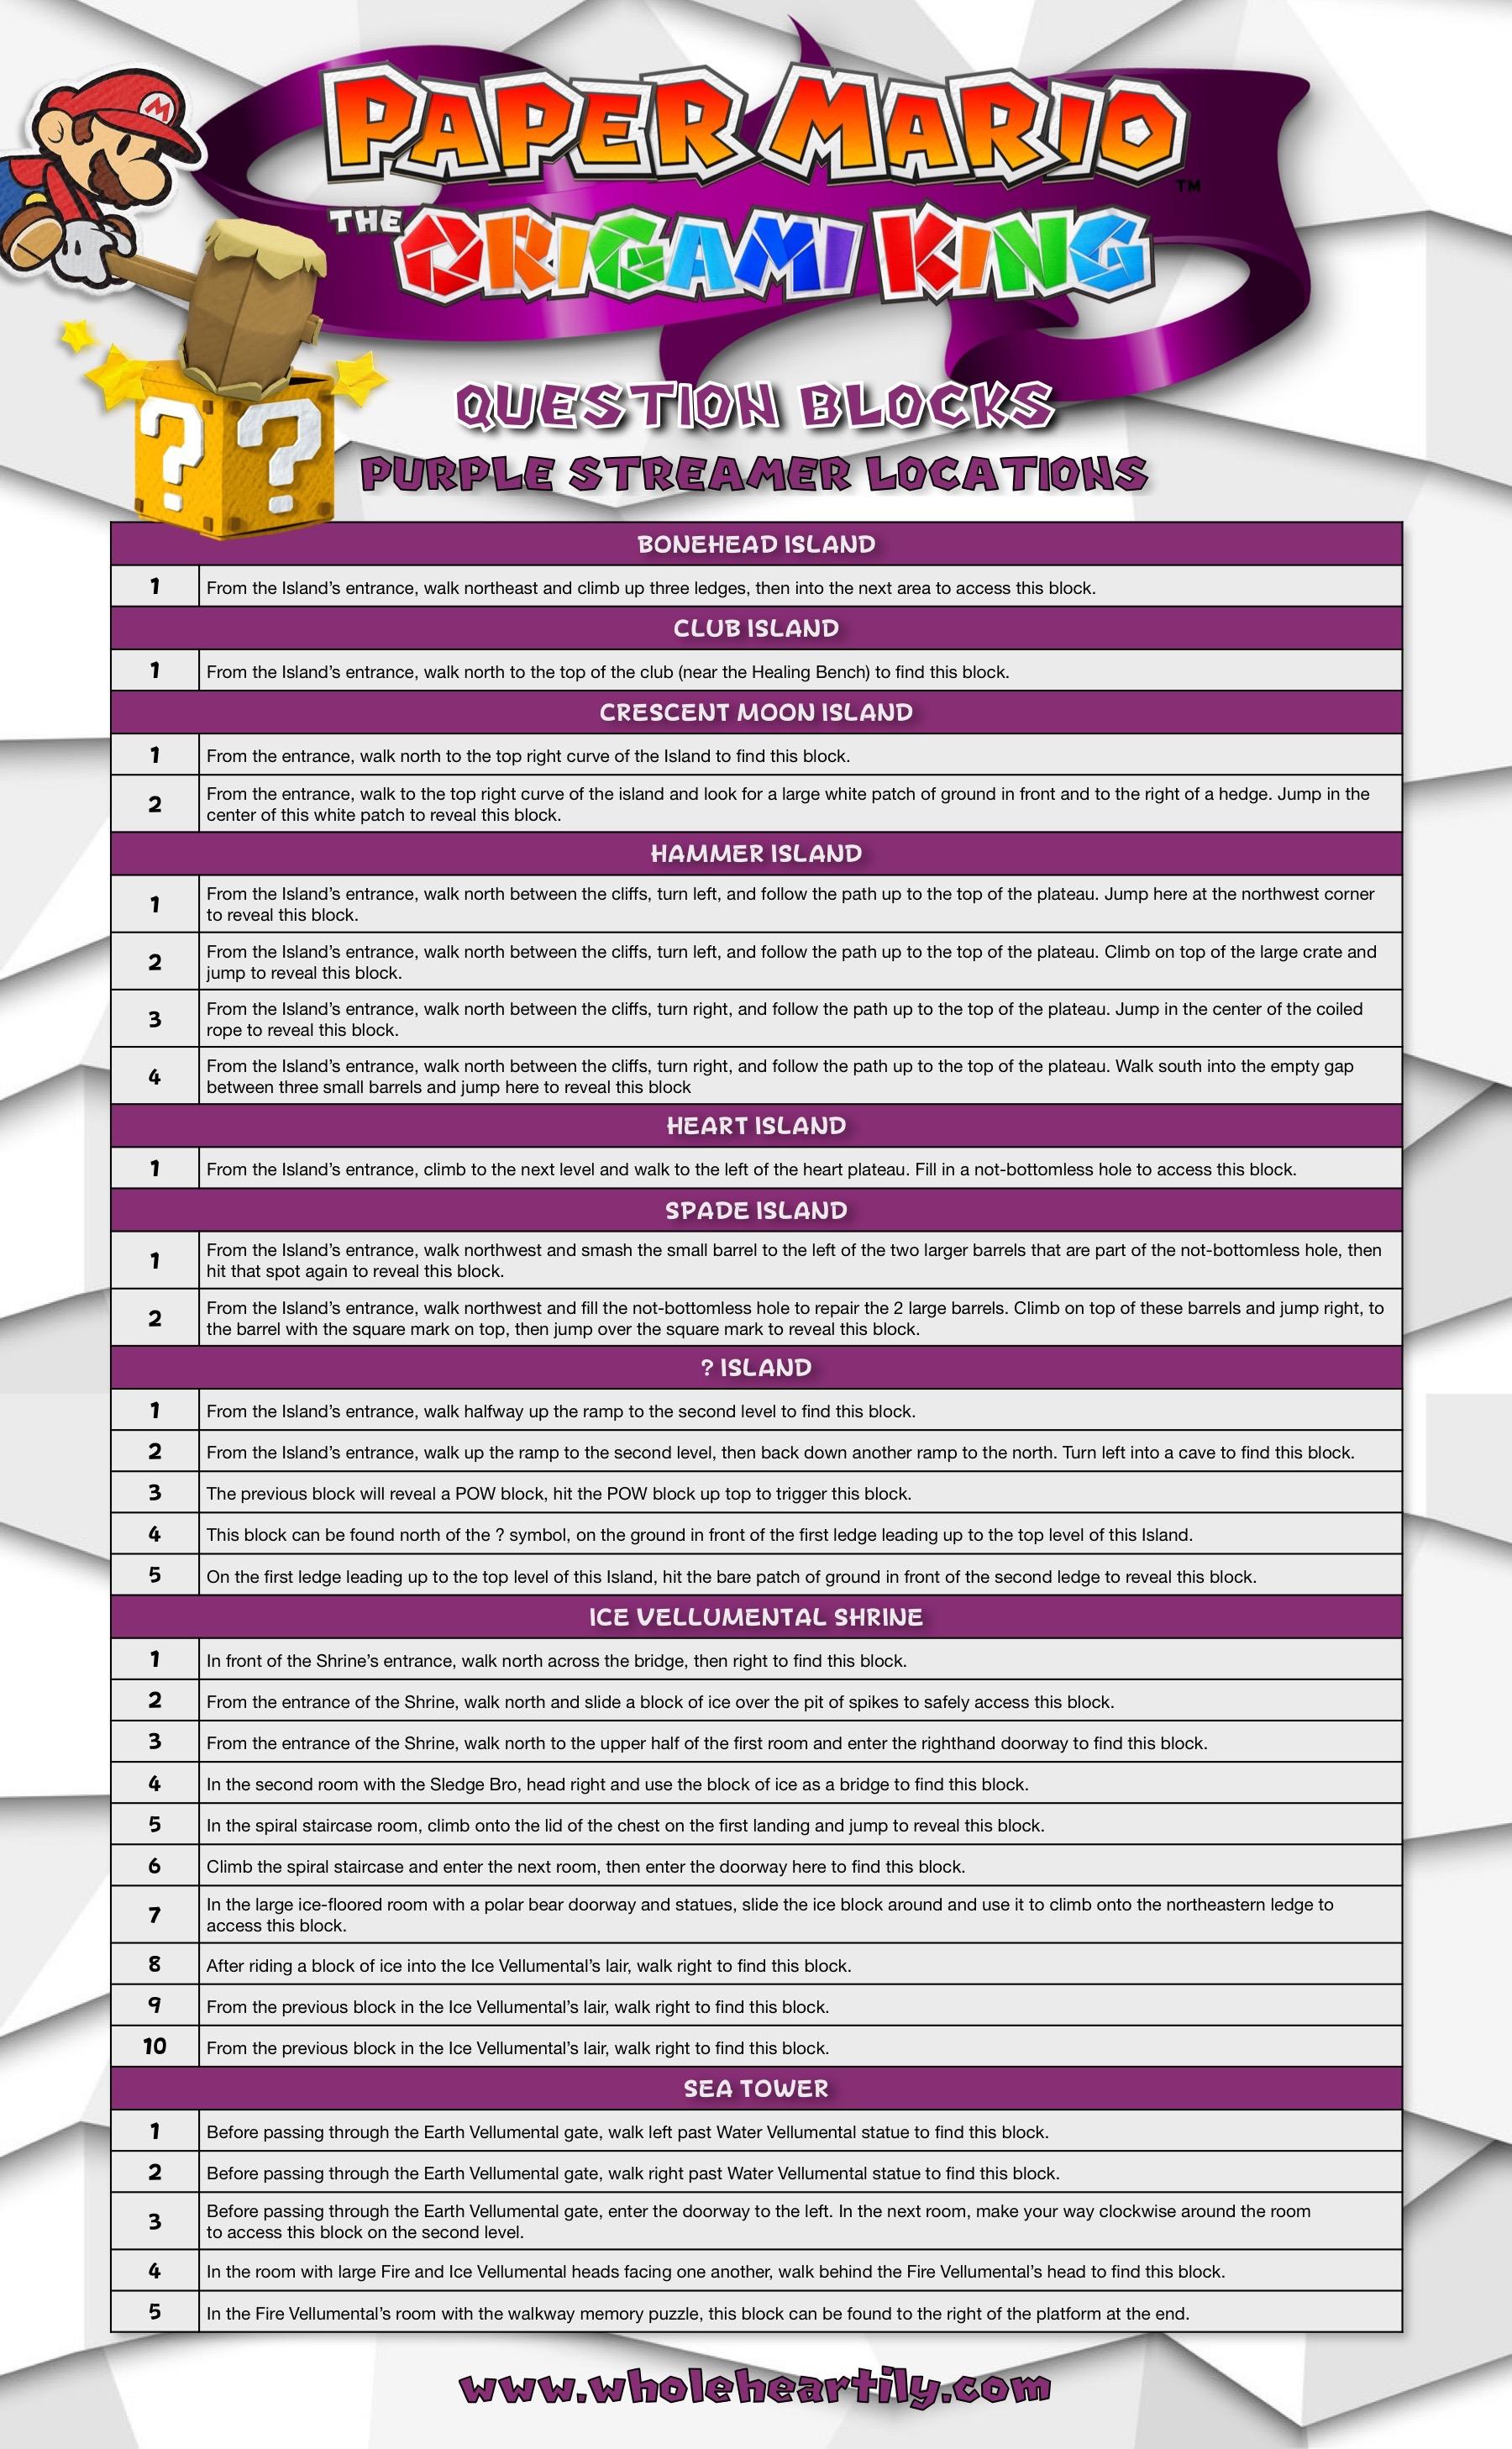 Paper Mario: The Origami King - Purple Streamer Question Blocks Guide